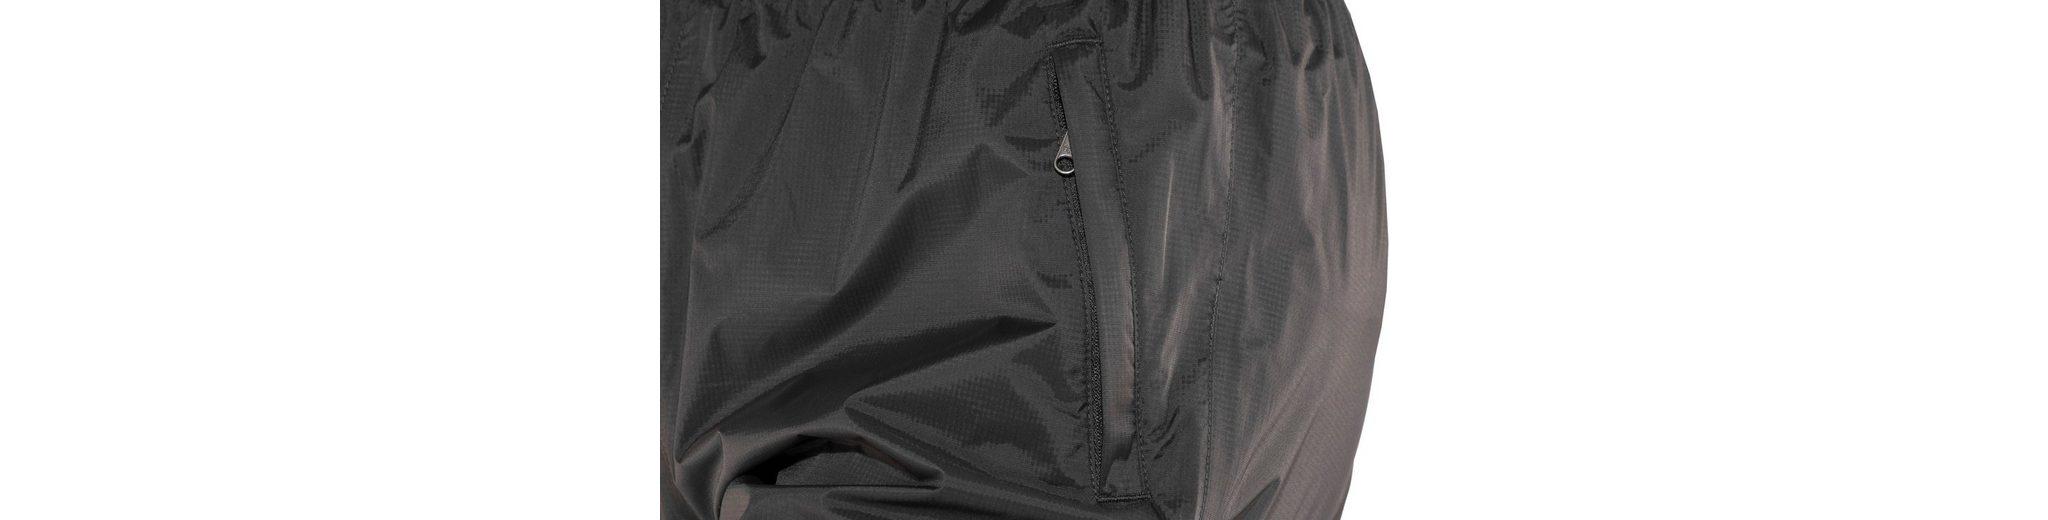 Marmot Hose PreCip Pant Women Günstig Kaufen Kosten Freies Verschiffen Sneakernews v6ZdJ